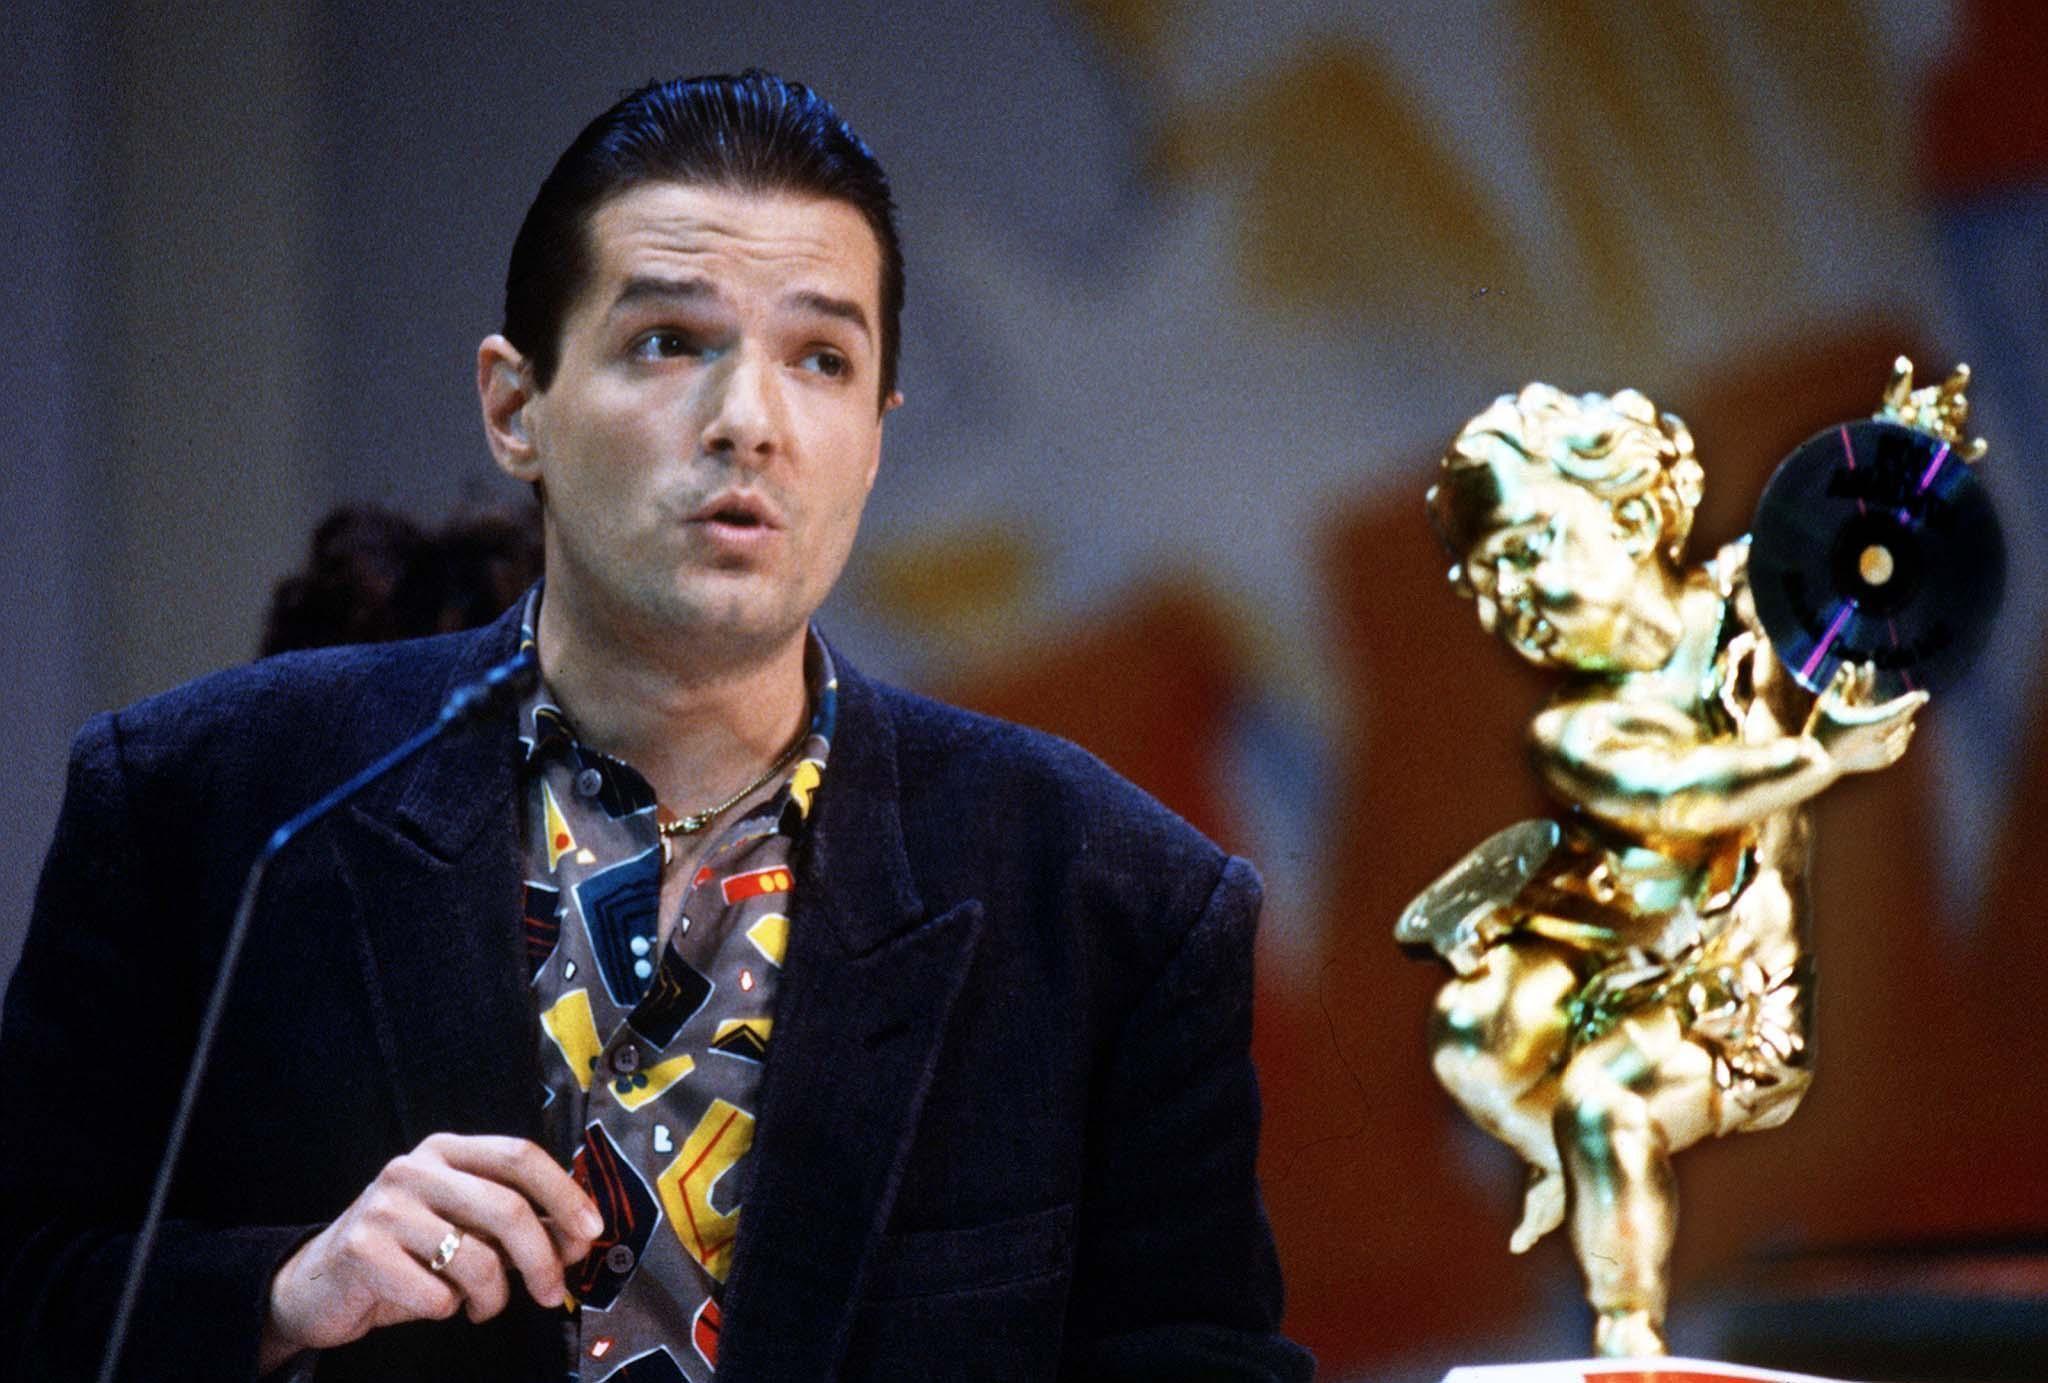 Falco Gedenknacht: Das Kult-Lokal Cabaret Fledermaus in Wien feiert den Sänger